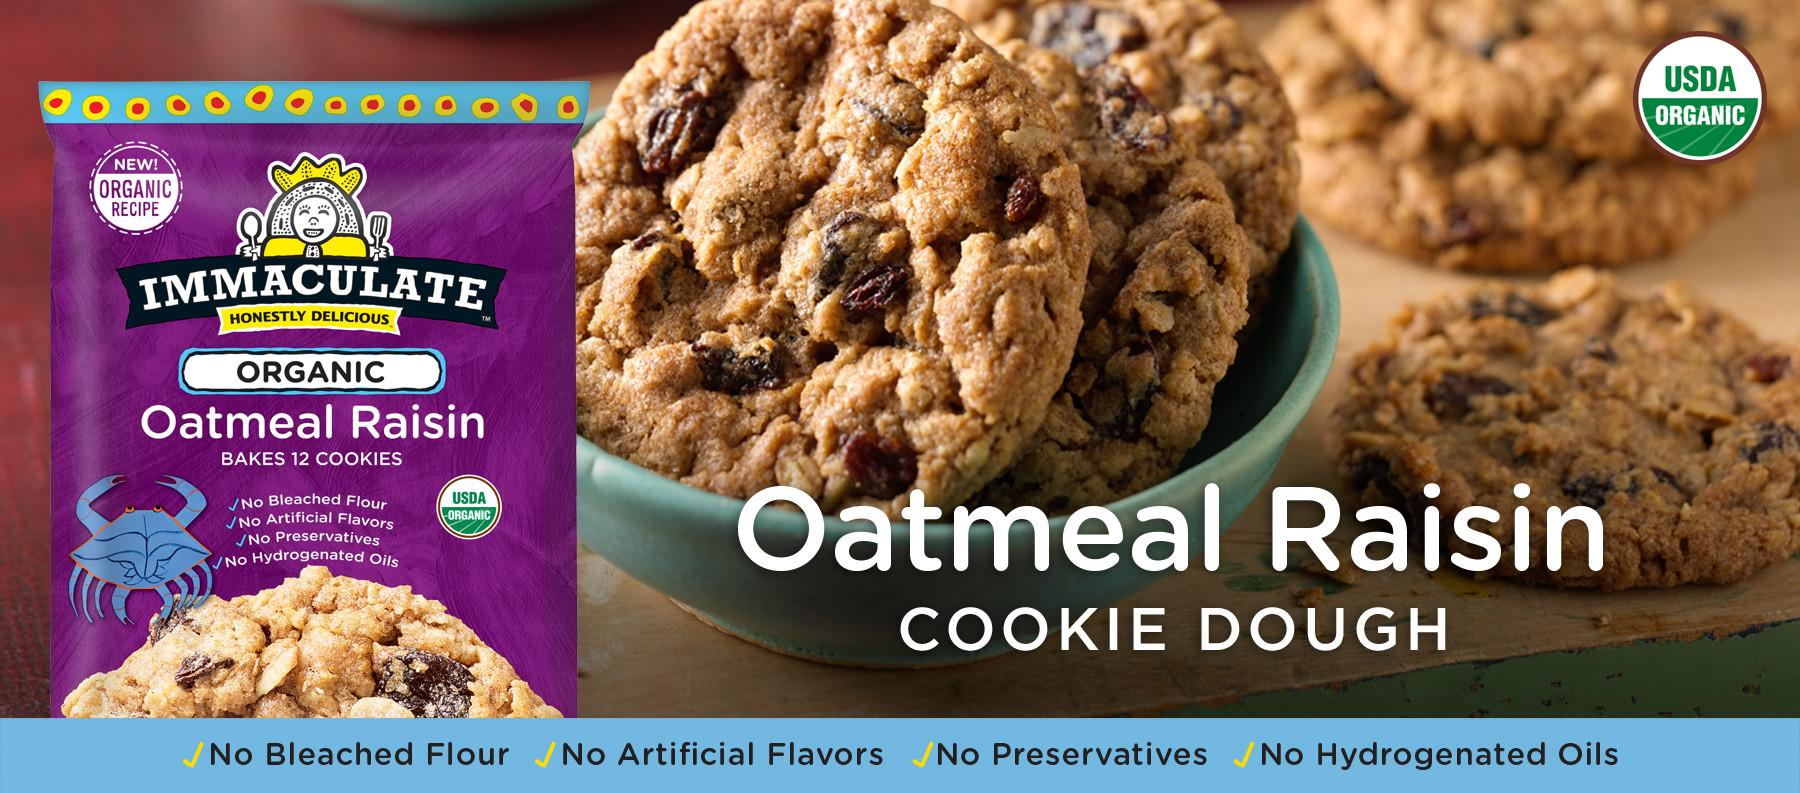 Organic Oatmeal Cookies  Organic Oatmeal Raisin Cookie Dough